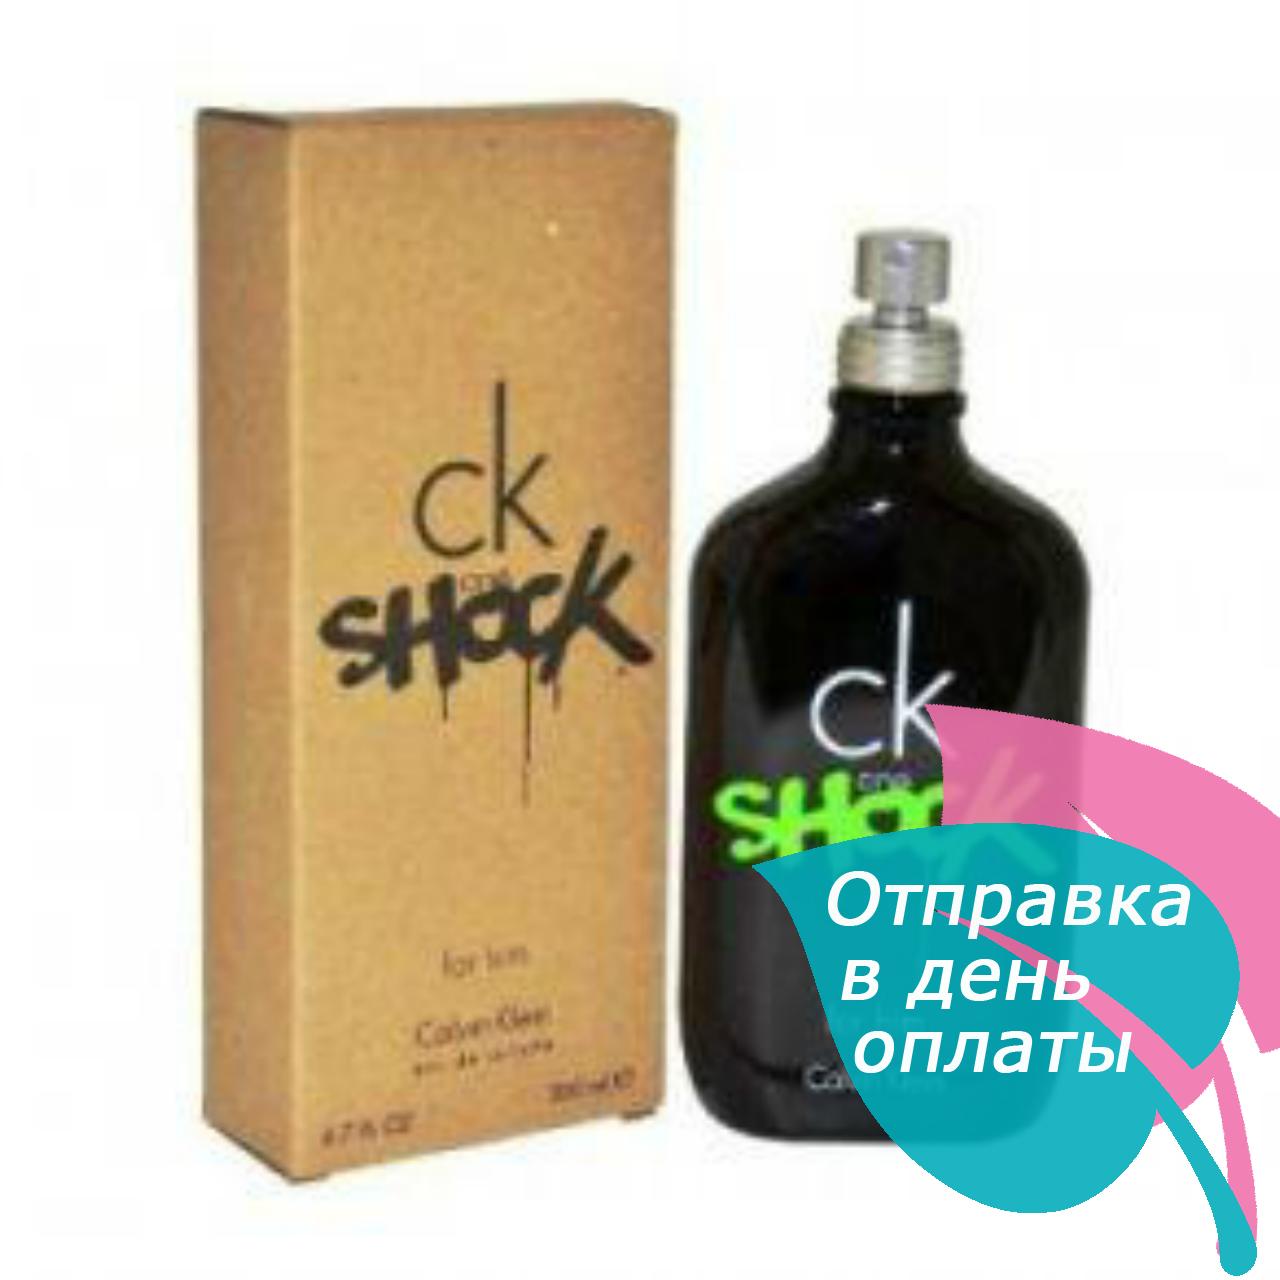 9c3f6b83d17c Calvin Klein CK One Shock for Him TESTER мужской, 100 мл - Bigl.ua